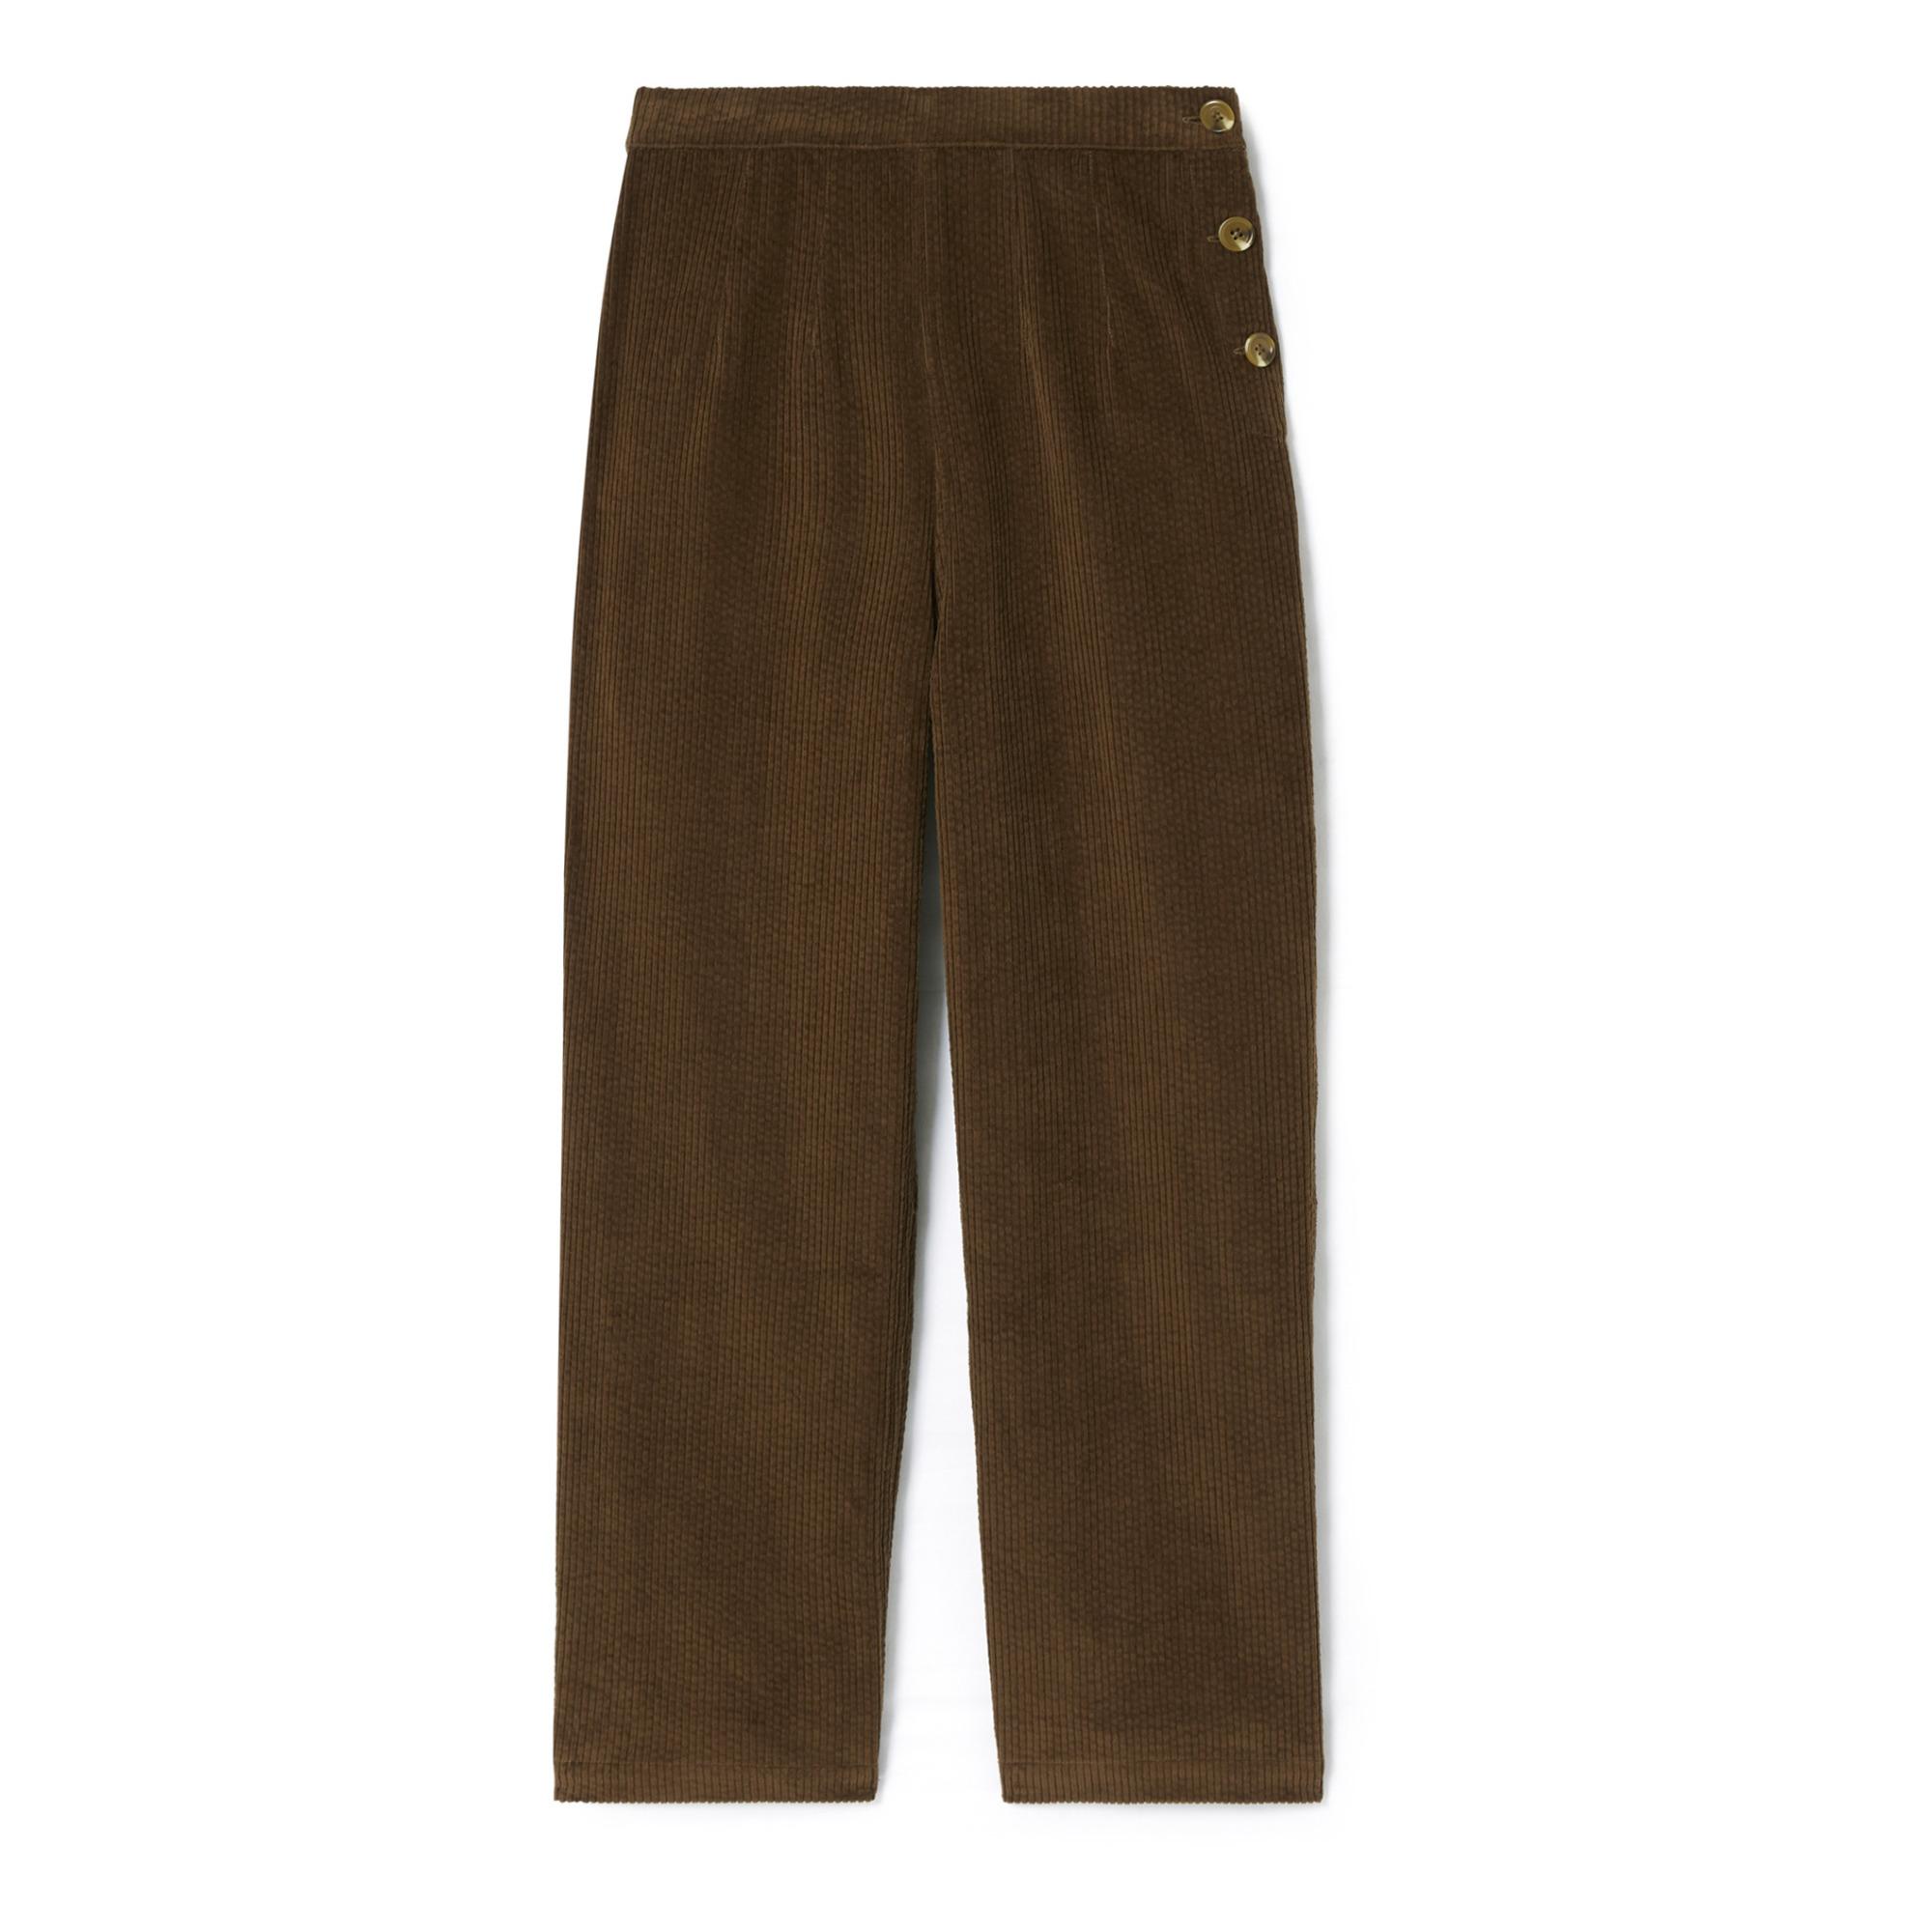 Pantalon Beatriz -Collection Femme-